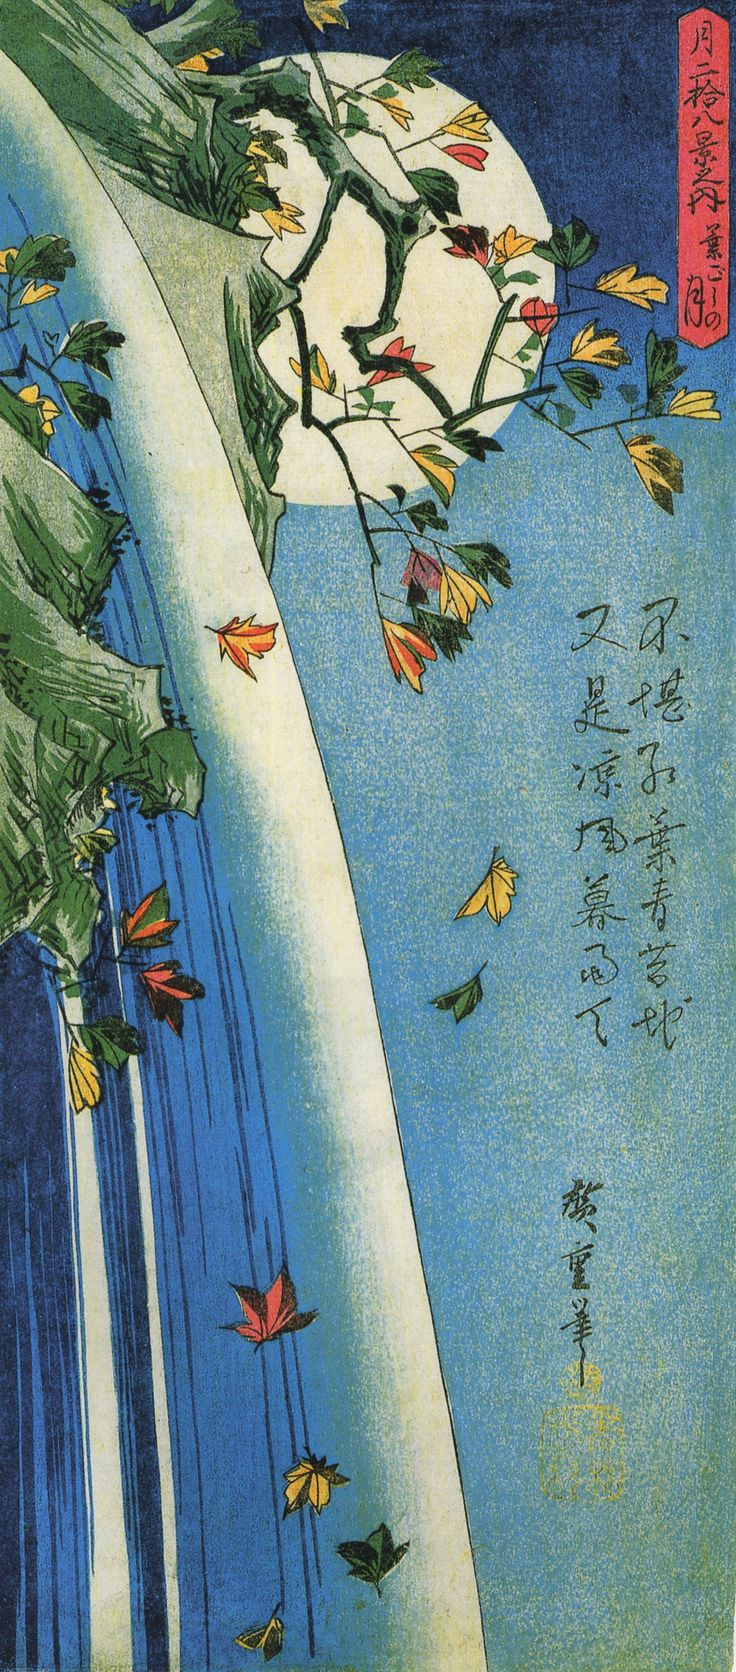 Utagawa Hiroshige ~ The Moon over a Waterfall